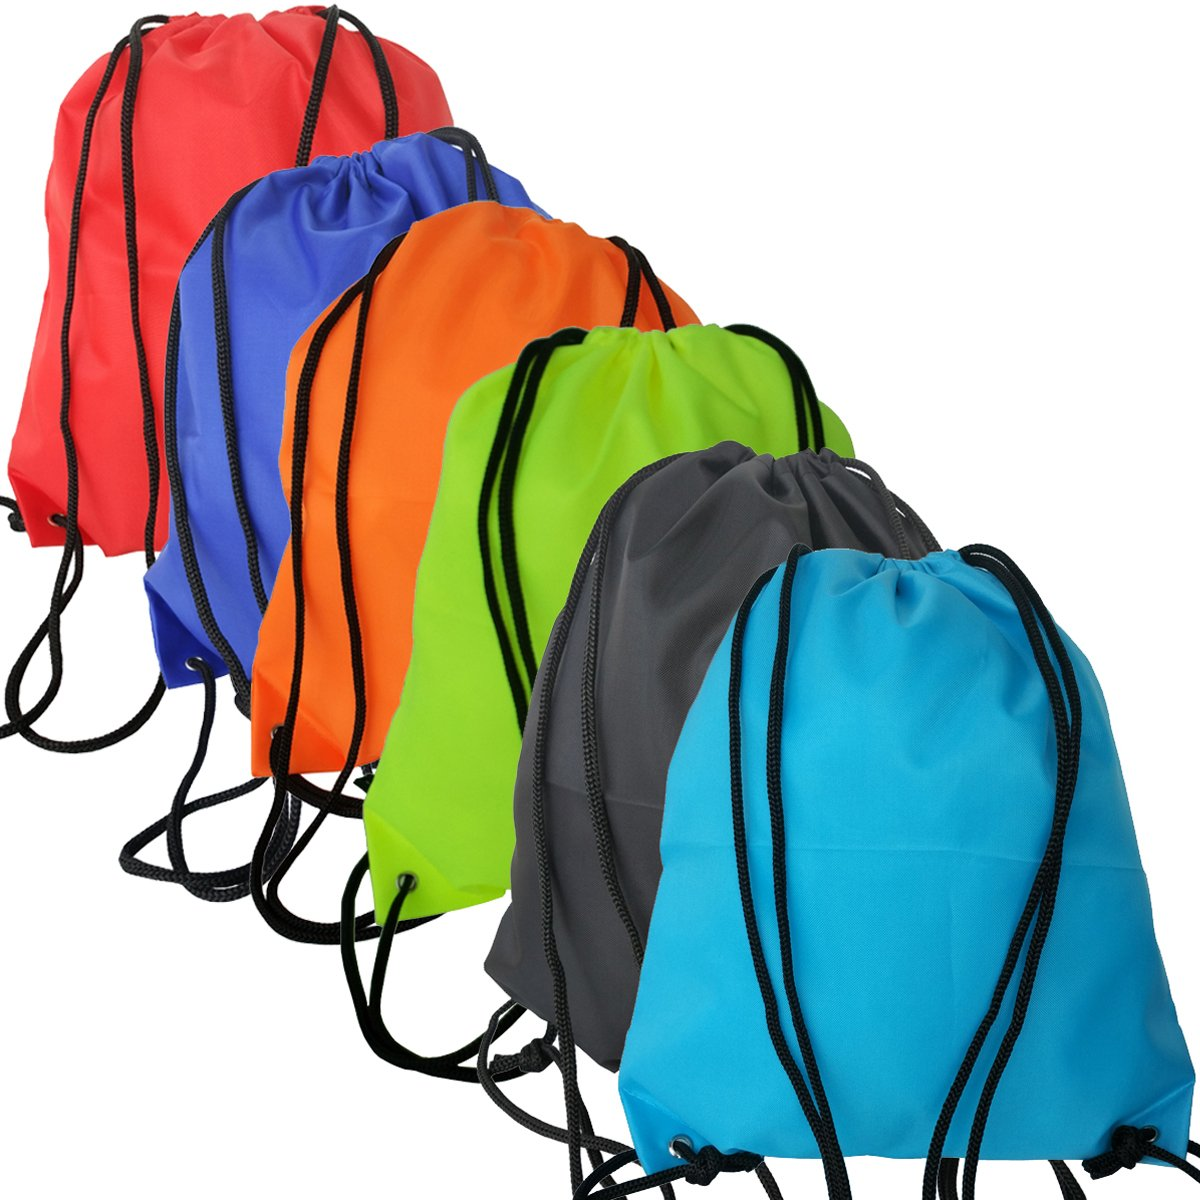 6 Pack Drawstring Backpack Bags 420D polyester fabric Folding Shoulder Cinch Bag by Topspeeder (Image #1)